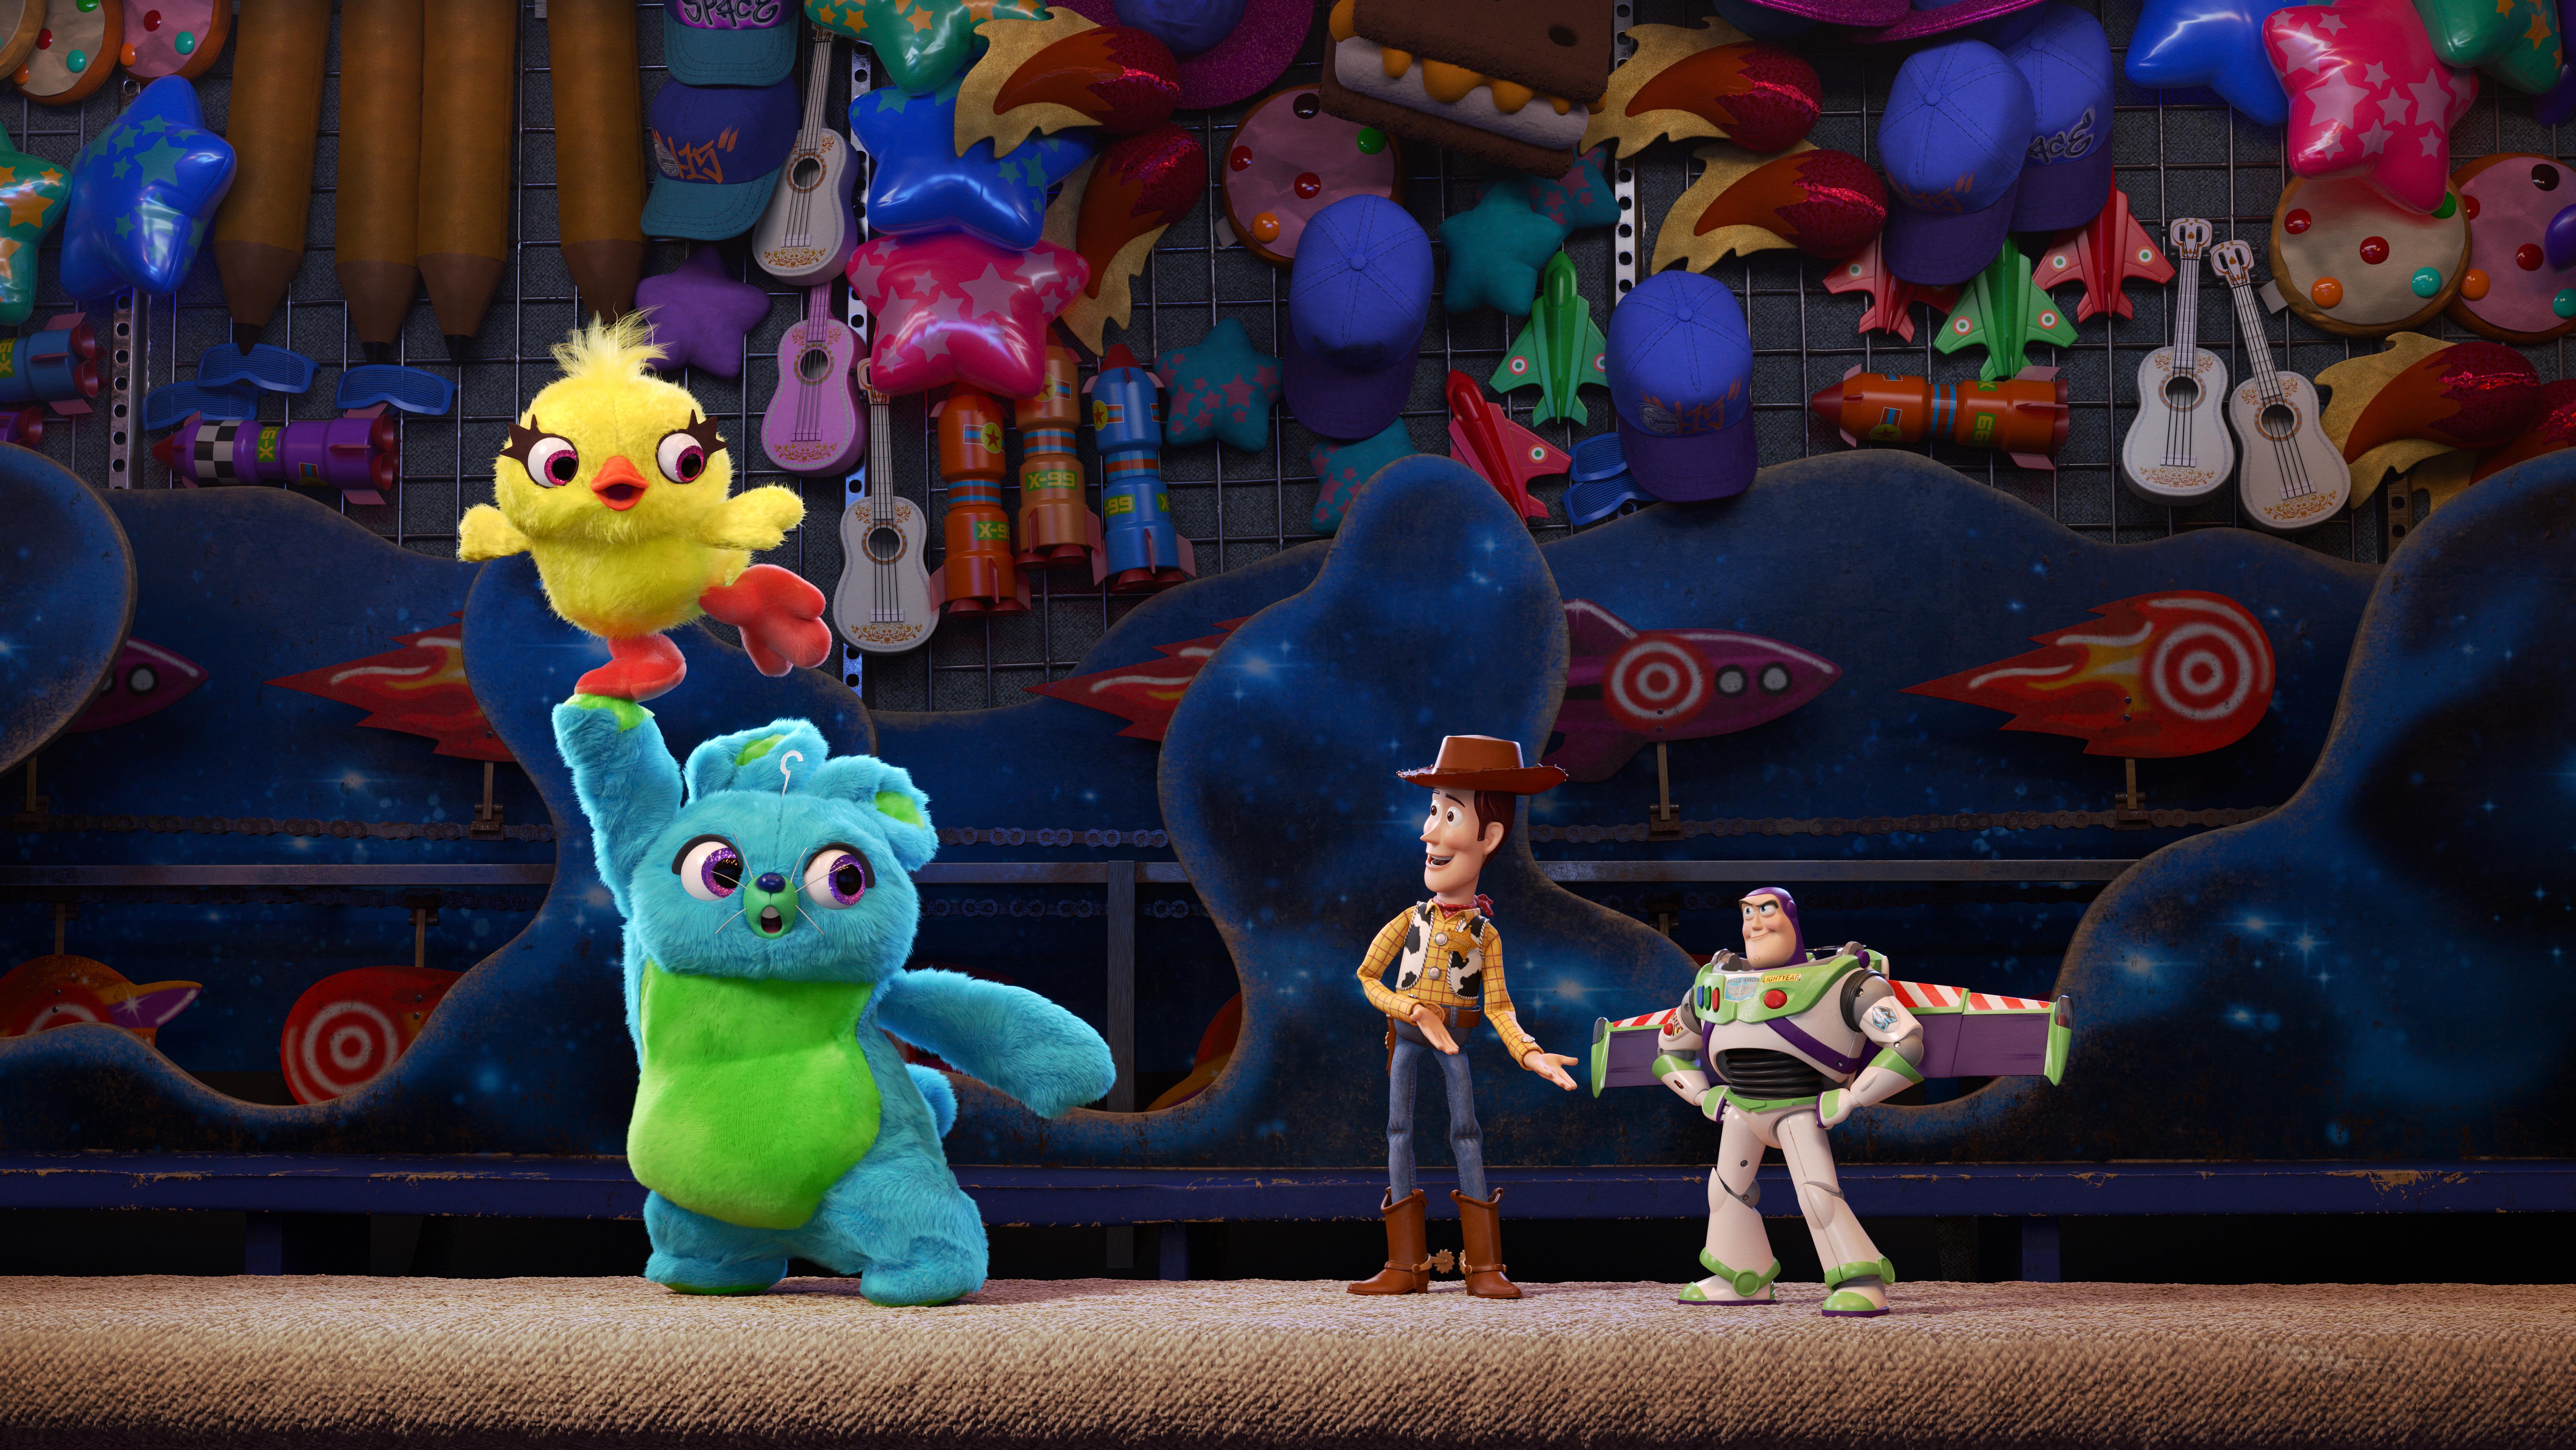 Keegan-Michael Key as Ducky, Jordan Peele as Bunny, Tom Hanks as Woody and Tim Allen as Buzz in Toy Story 4